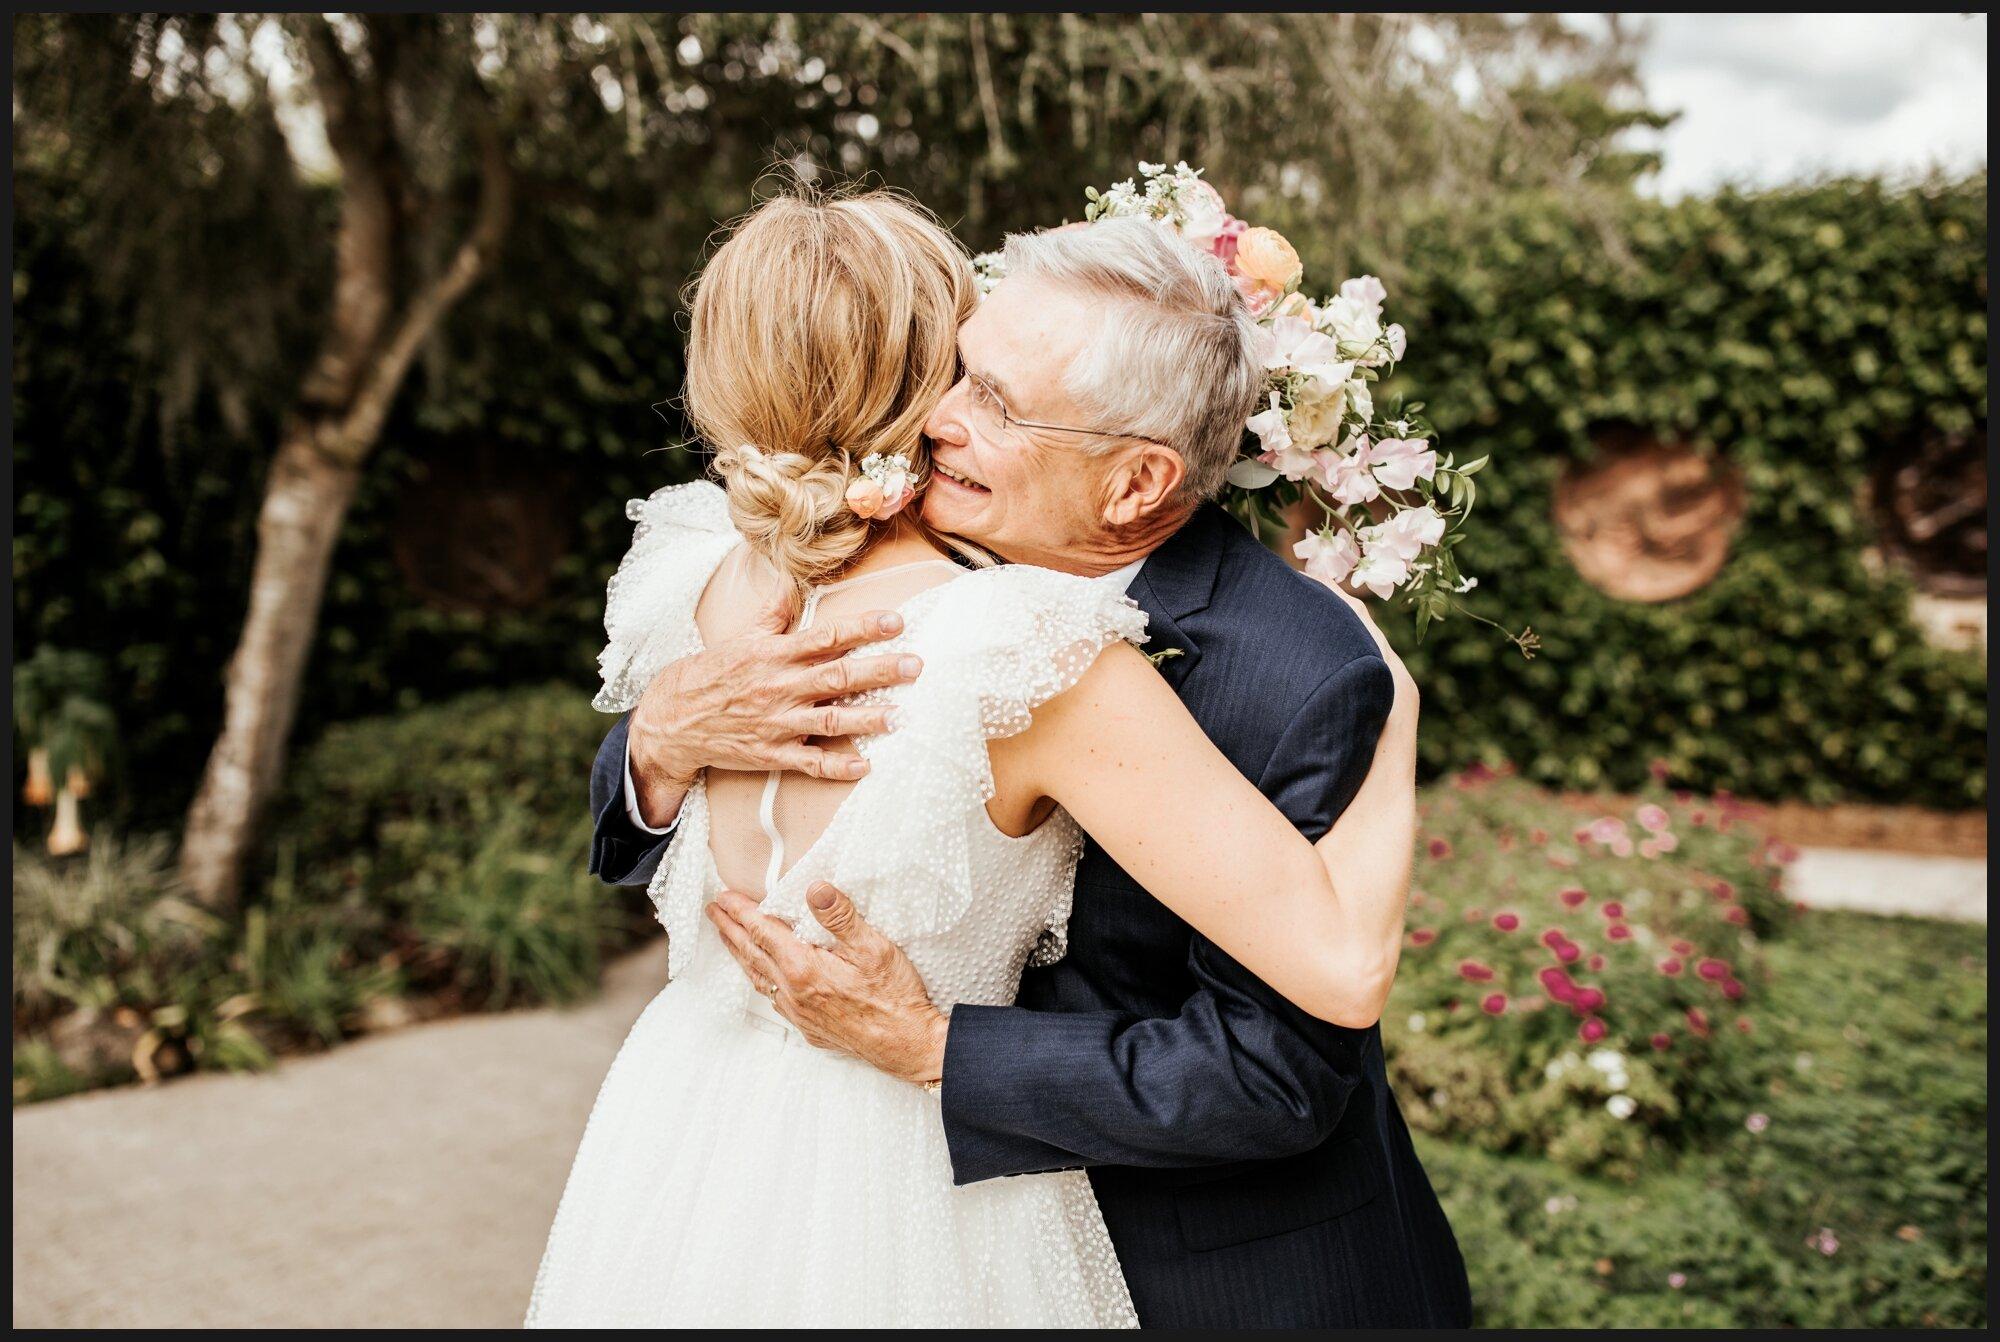 Orlando-Wedding-Photographer-destination-wedding-photographer-florida-wedding-photographer-hawaii-wedding-photographer_0749.jpg